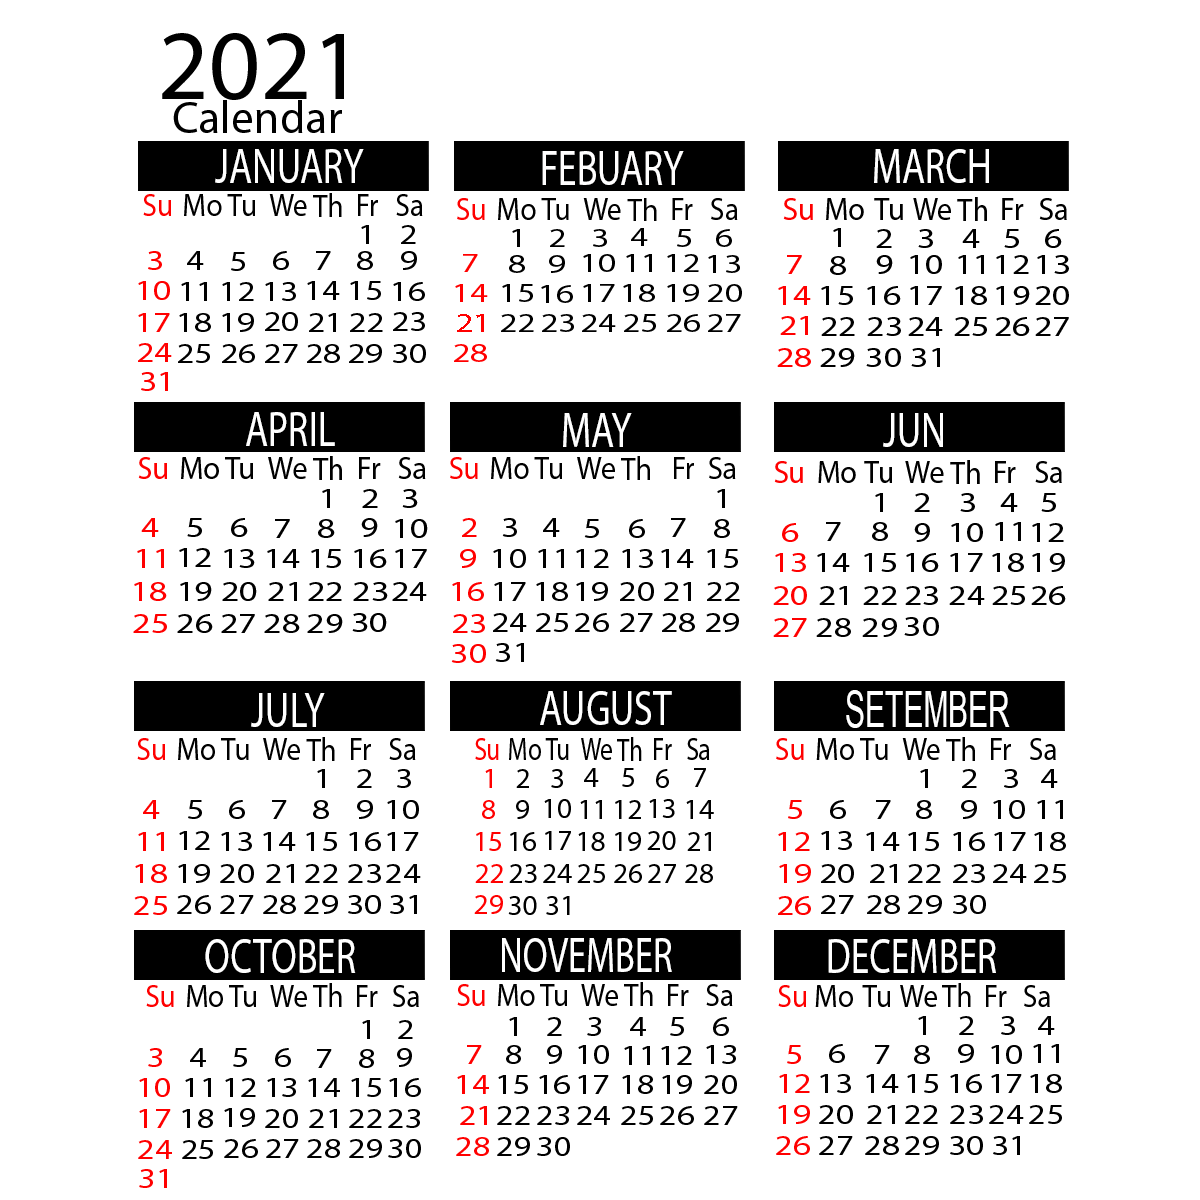 2021 Yearly Calendar Printable | Calendar 2021 in 2020 | New year